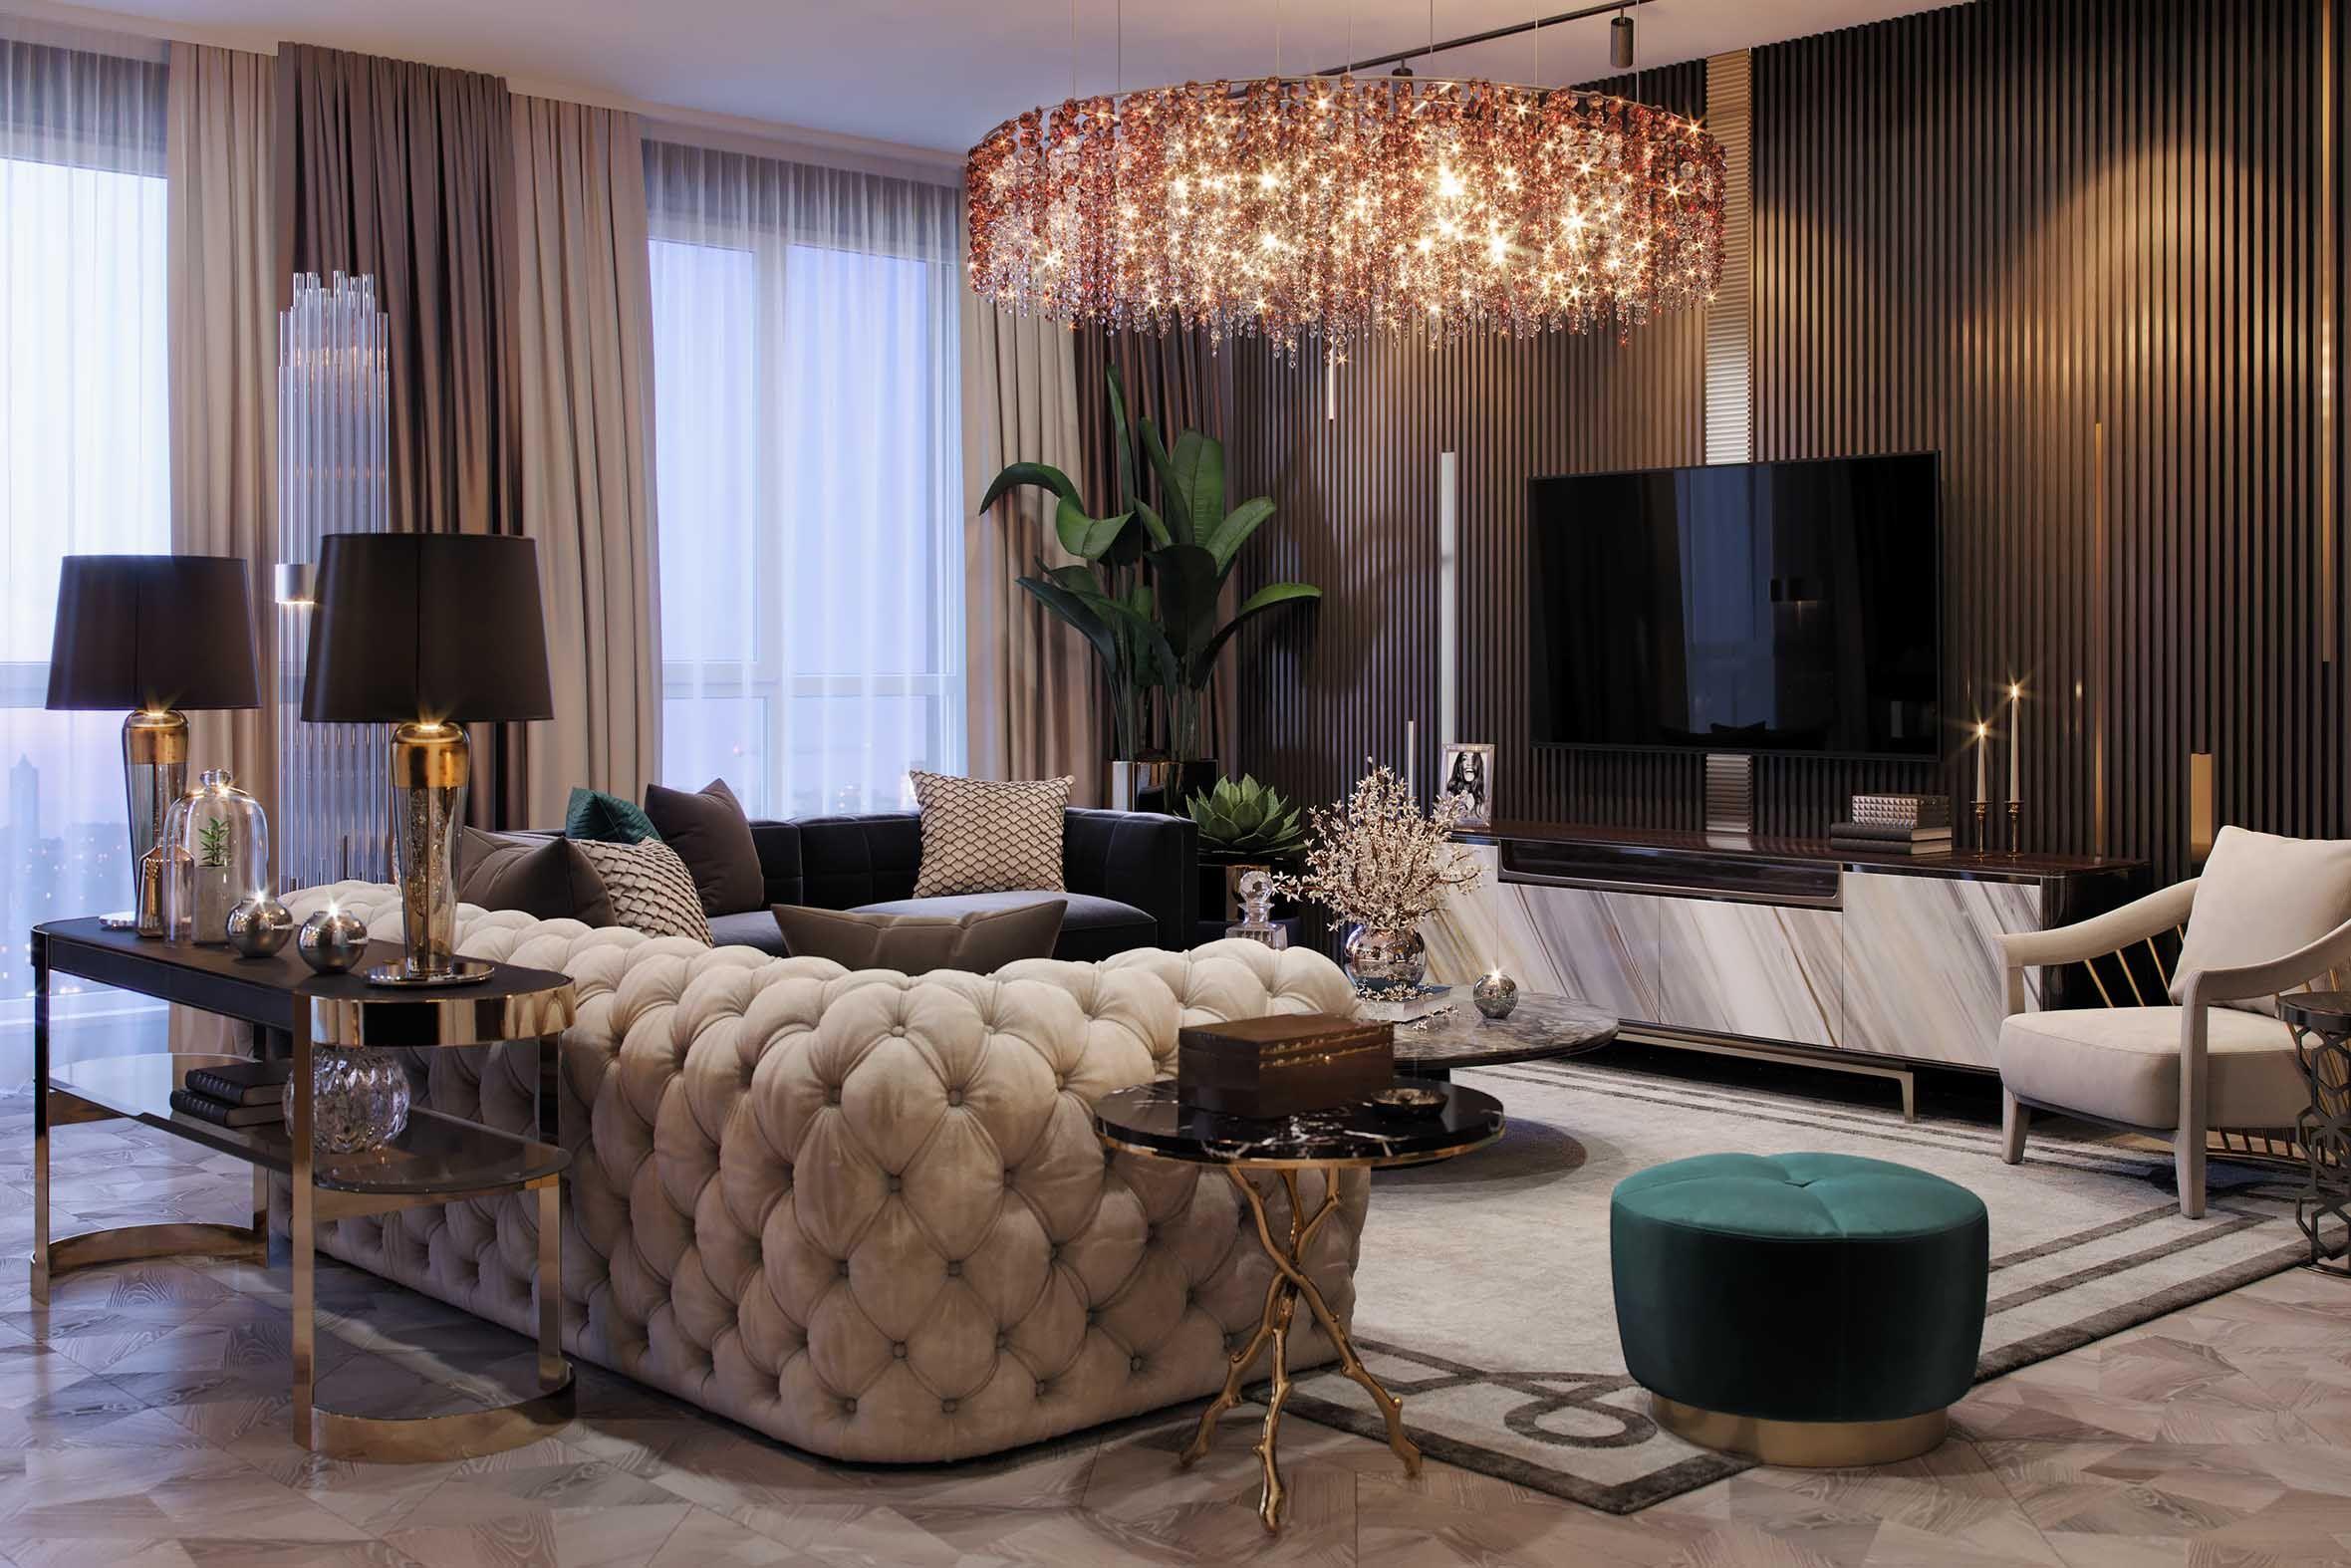 Luxury Modern Style Living Room Decor With Restoration Hardware Inspired Soho Living Room Decor Modern Modern Style Living Room Decor Modern Style Living Room